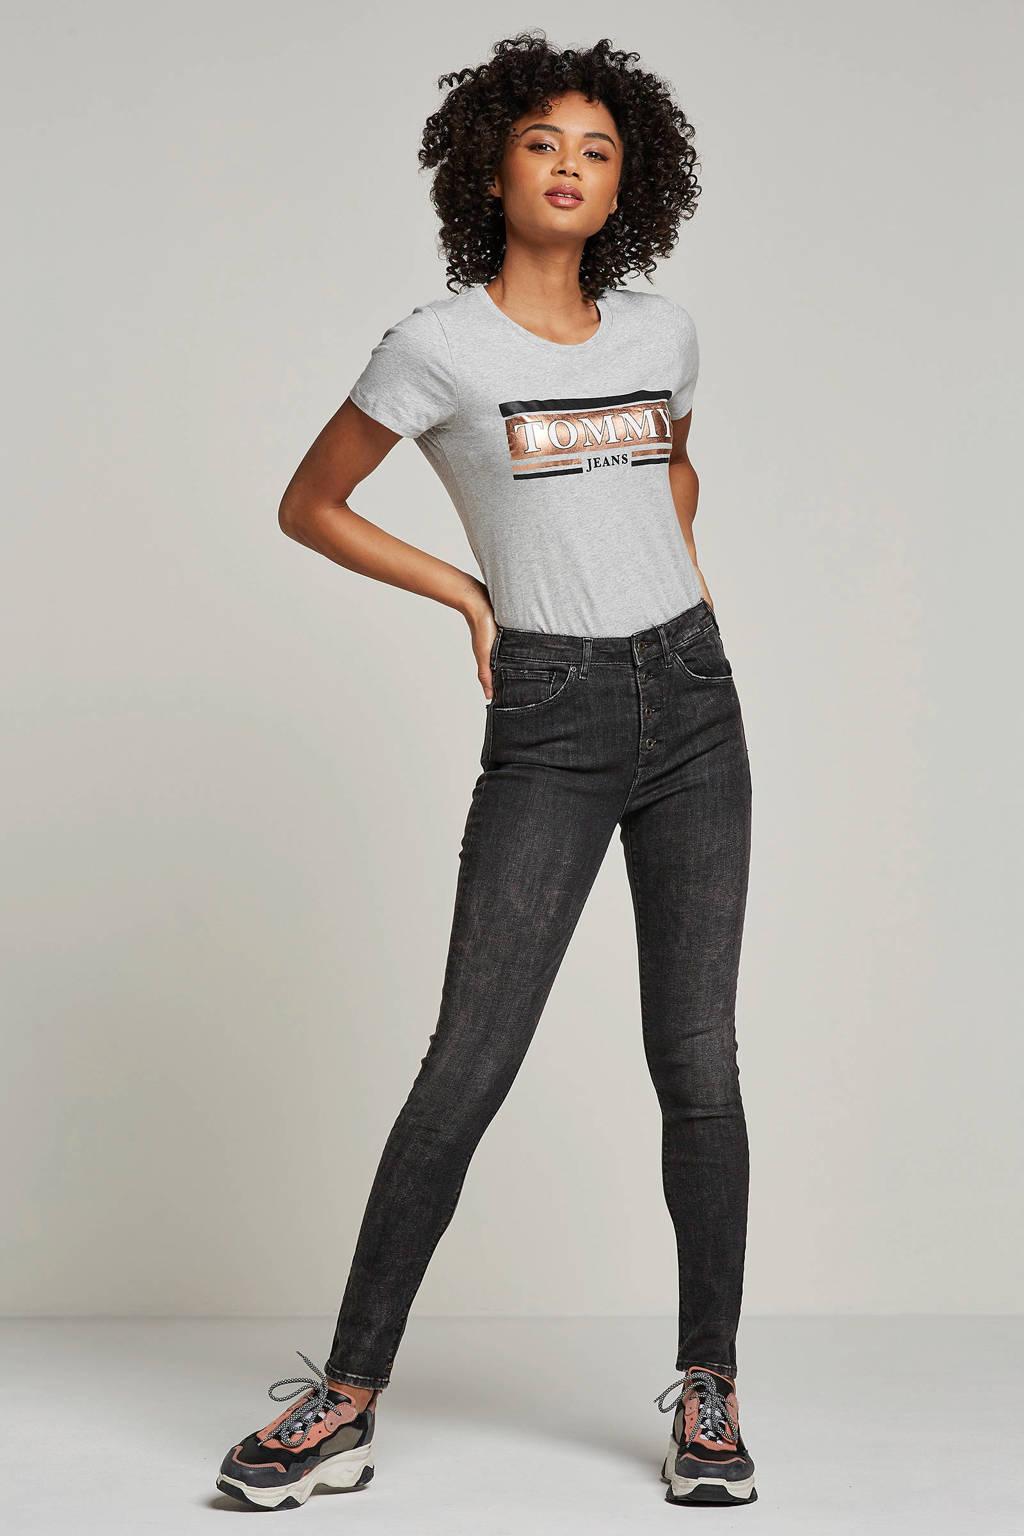 Tommy Jeans T-shirt met logo, Grijs